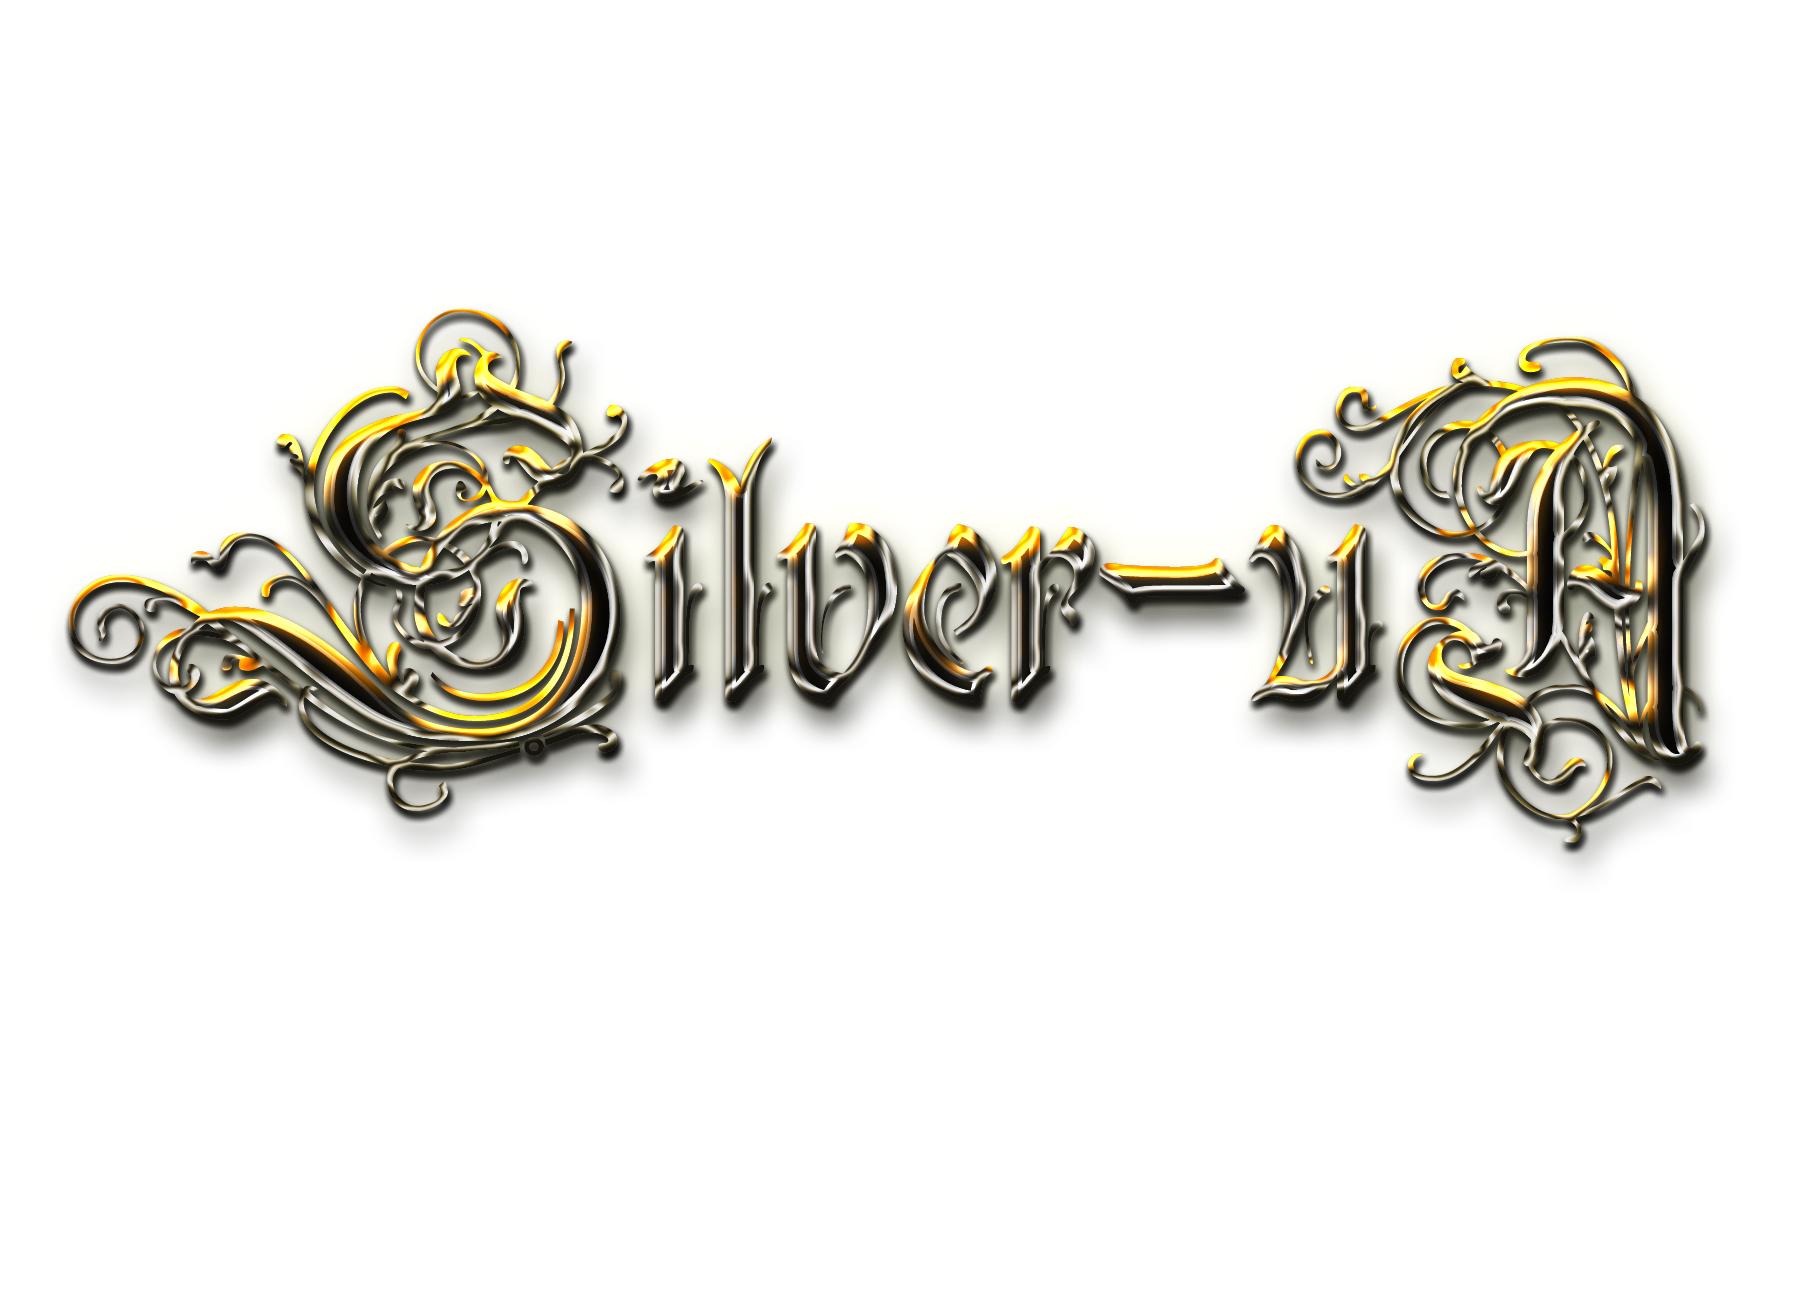 Silver-ua - New LOGO